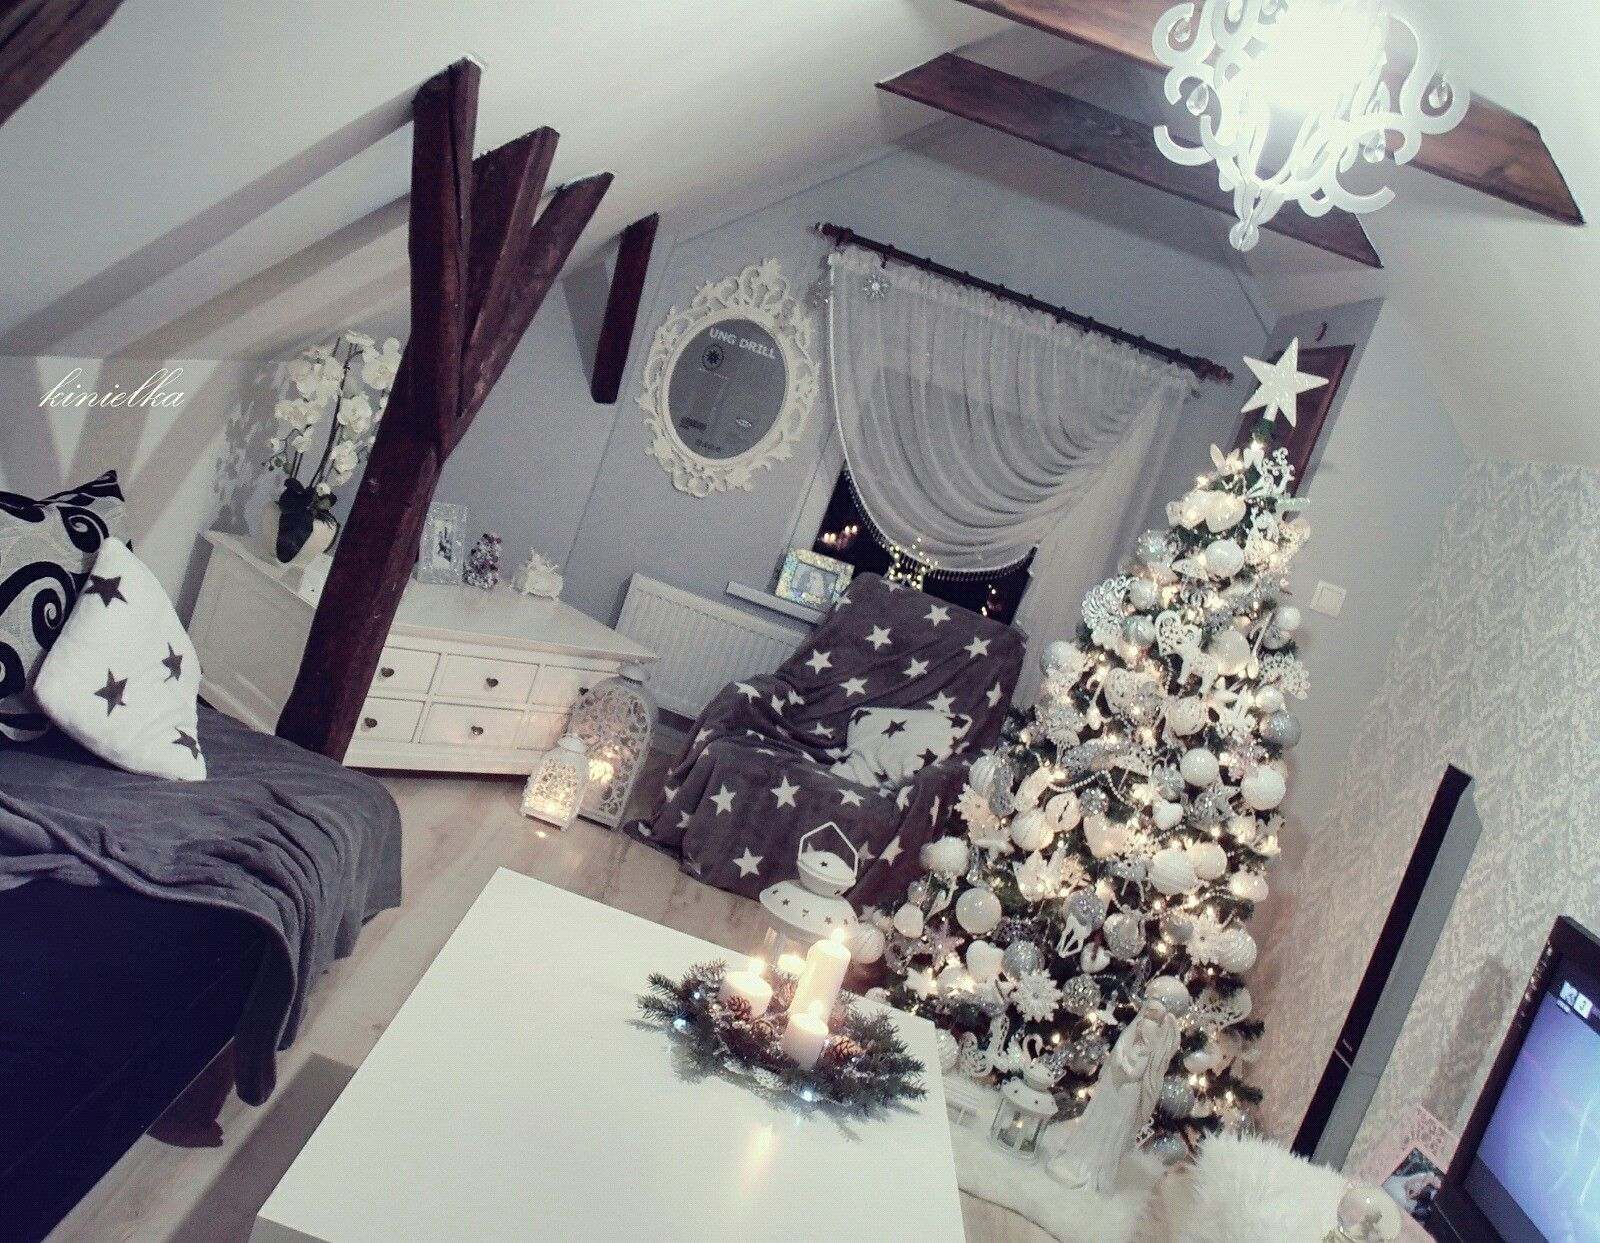 Swiateczny Pokoj Choinka Christmas Tree Christmas Decoration Ikea Eurofirany Home You Christmas Choinka Christmas Holiday Decor Christmas Decorations Decor